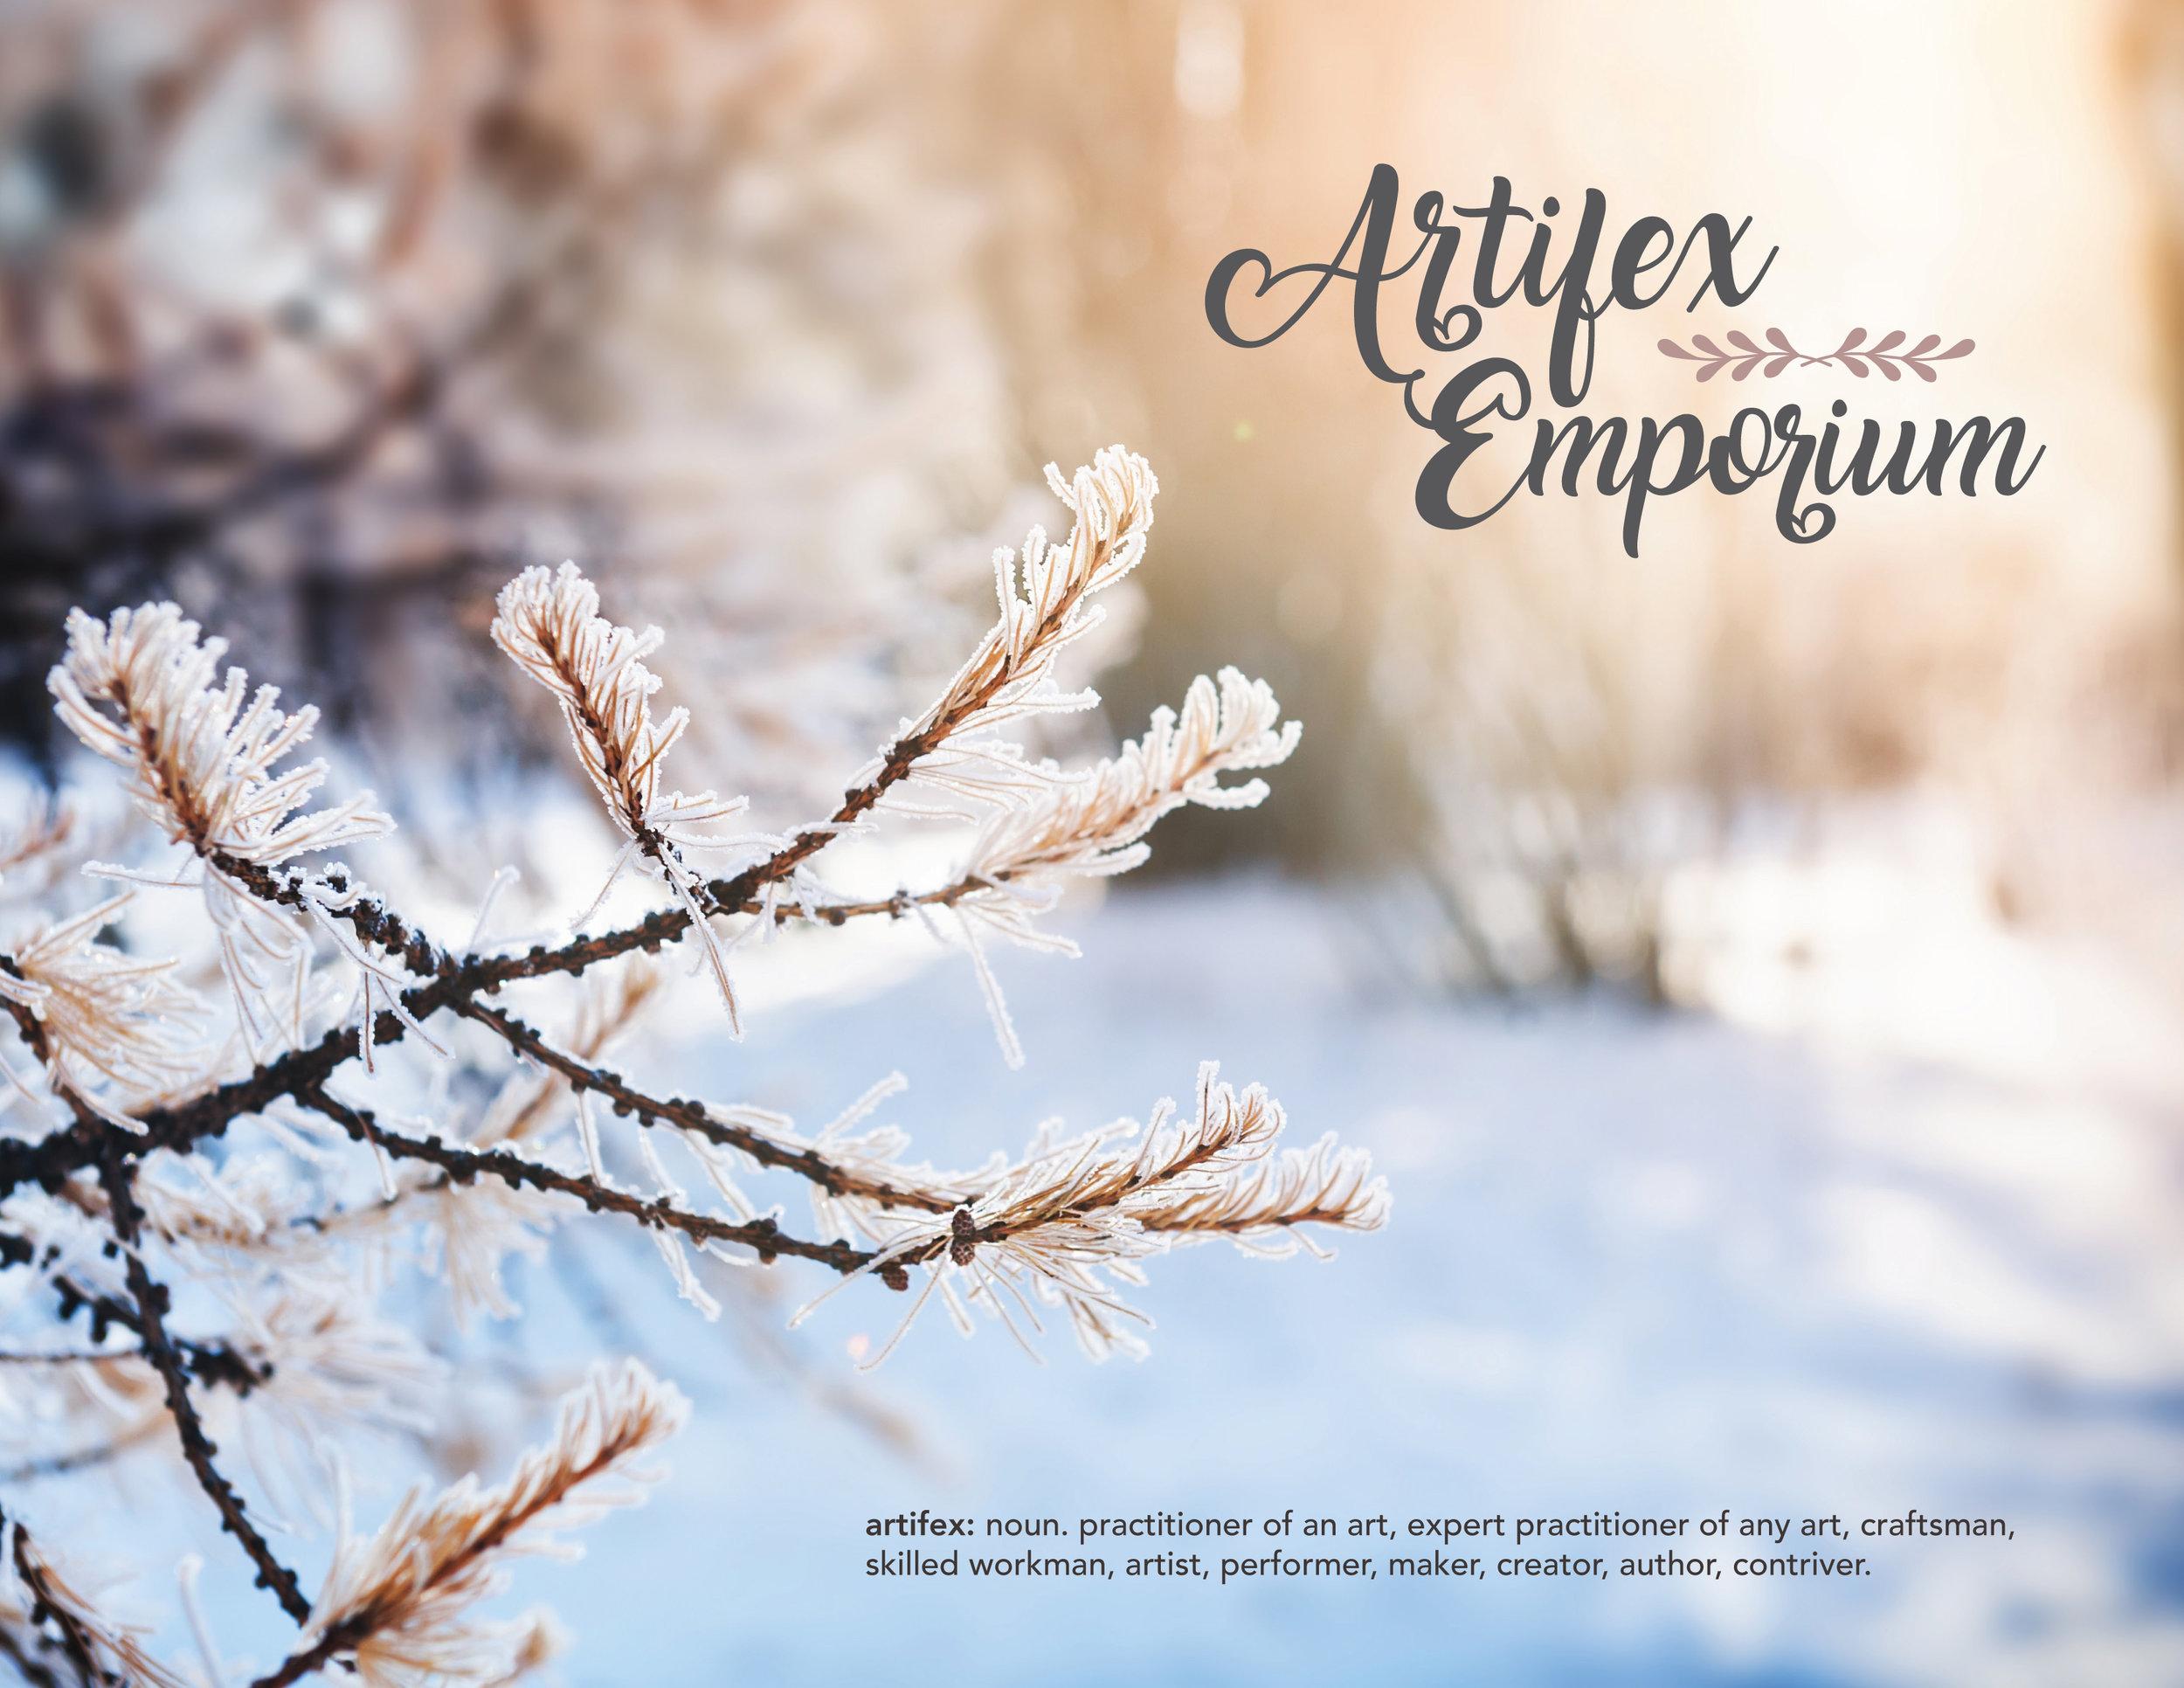 ArtifexEmporium_Holiday_2018_11-9-18_HIRES-1.jpg